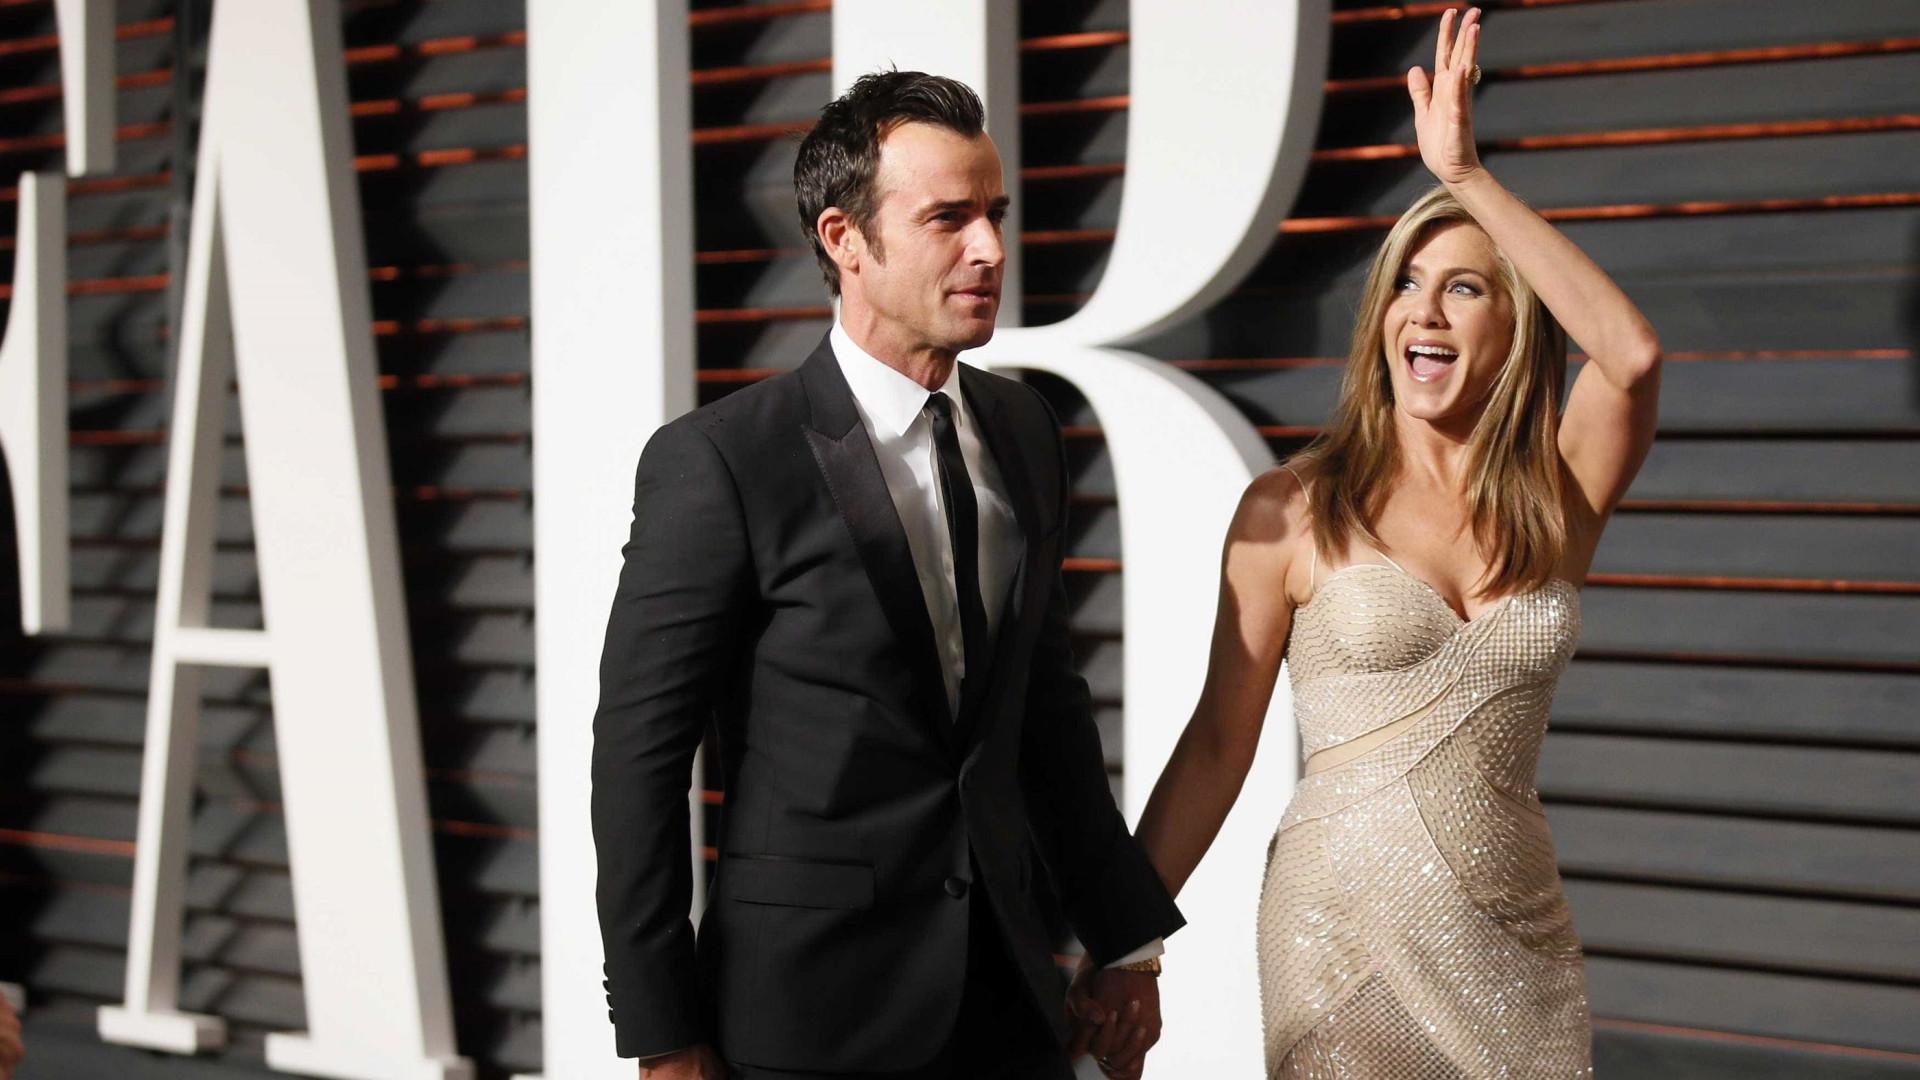 Justin Theroux fala pela 1ª vez sobre divórcio com Jennifer Aniston